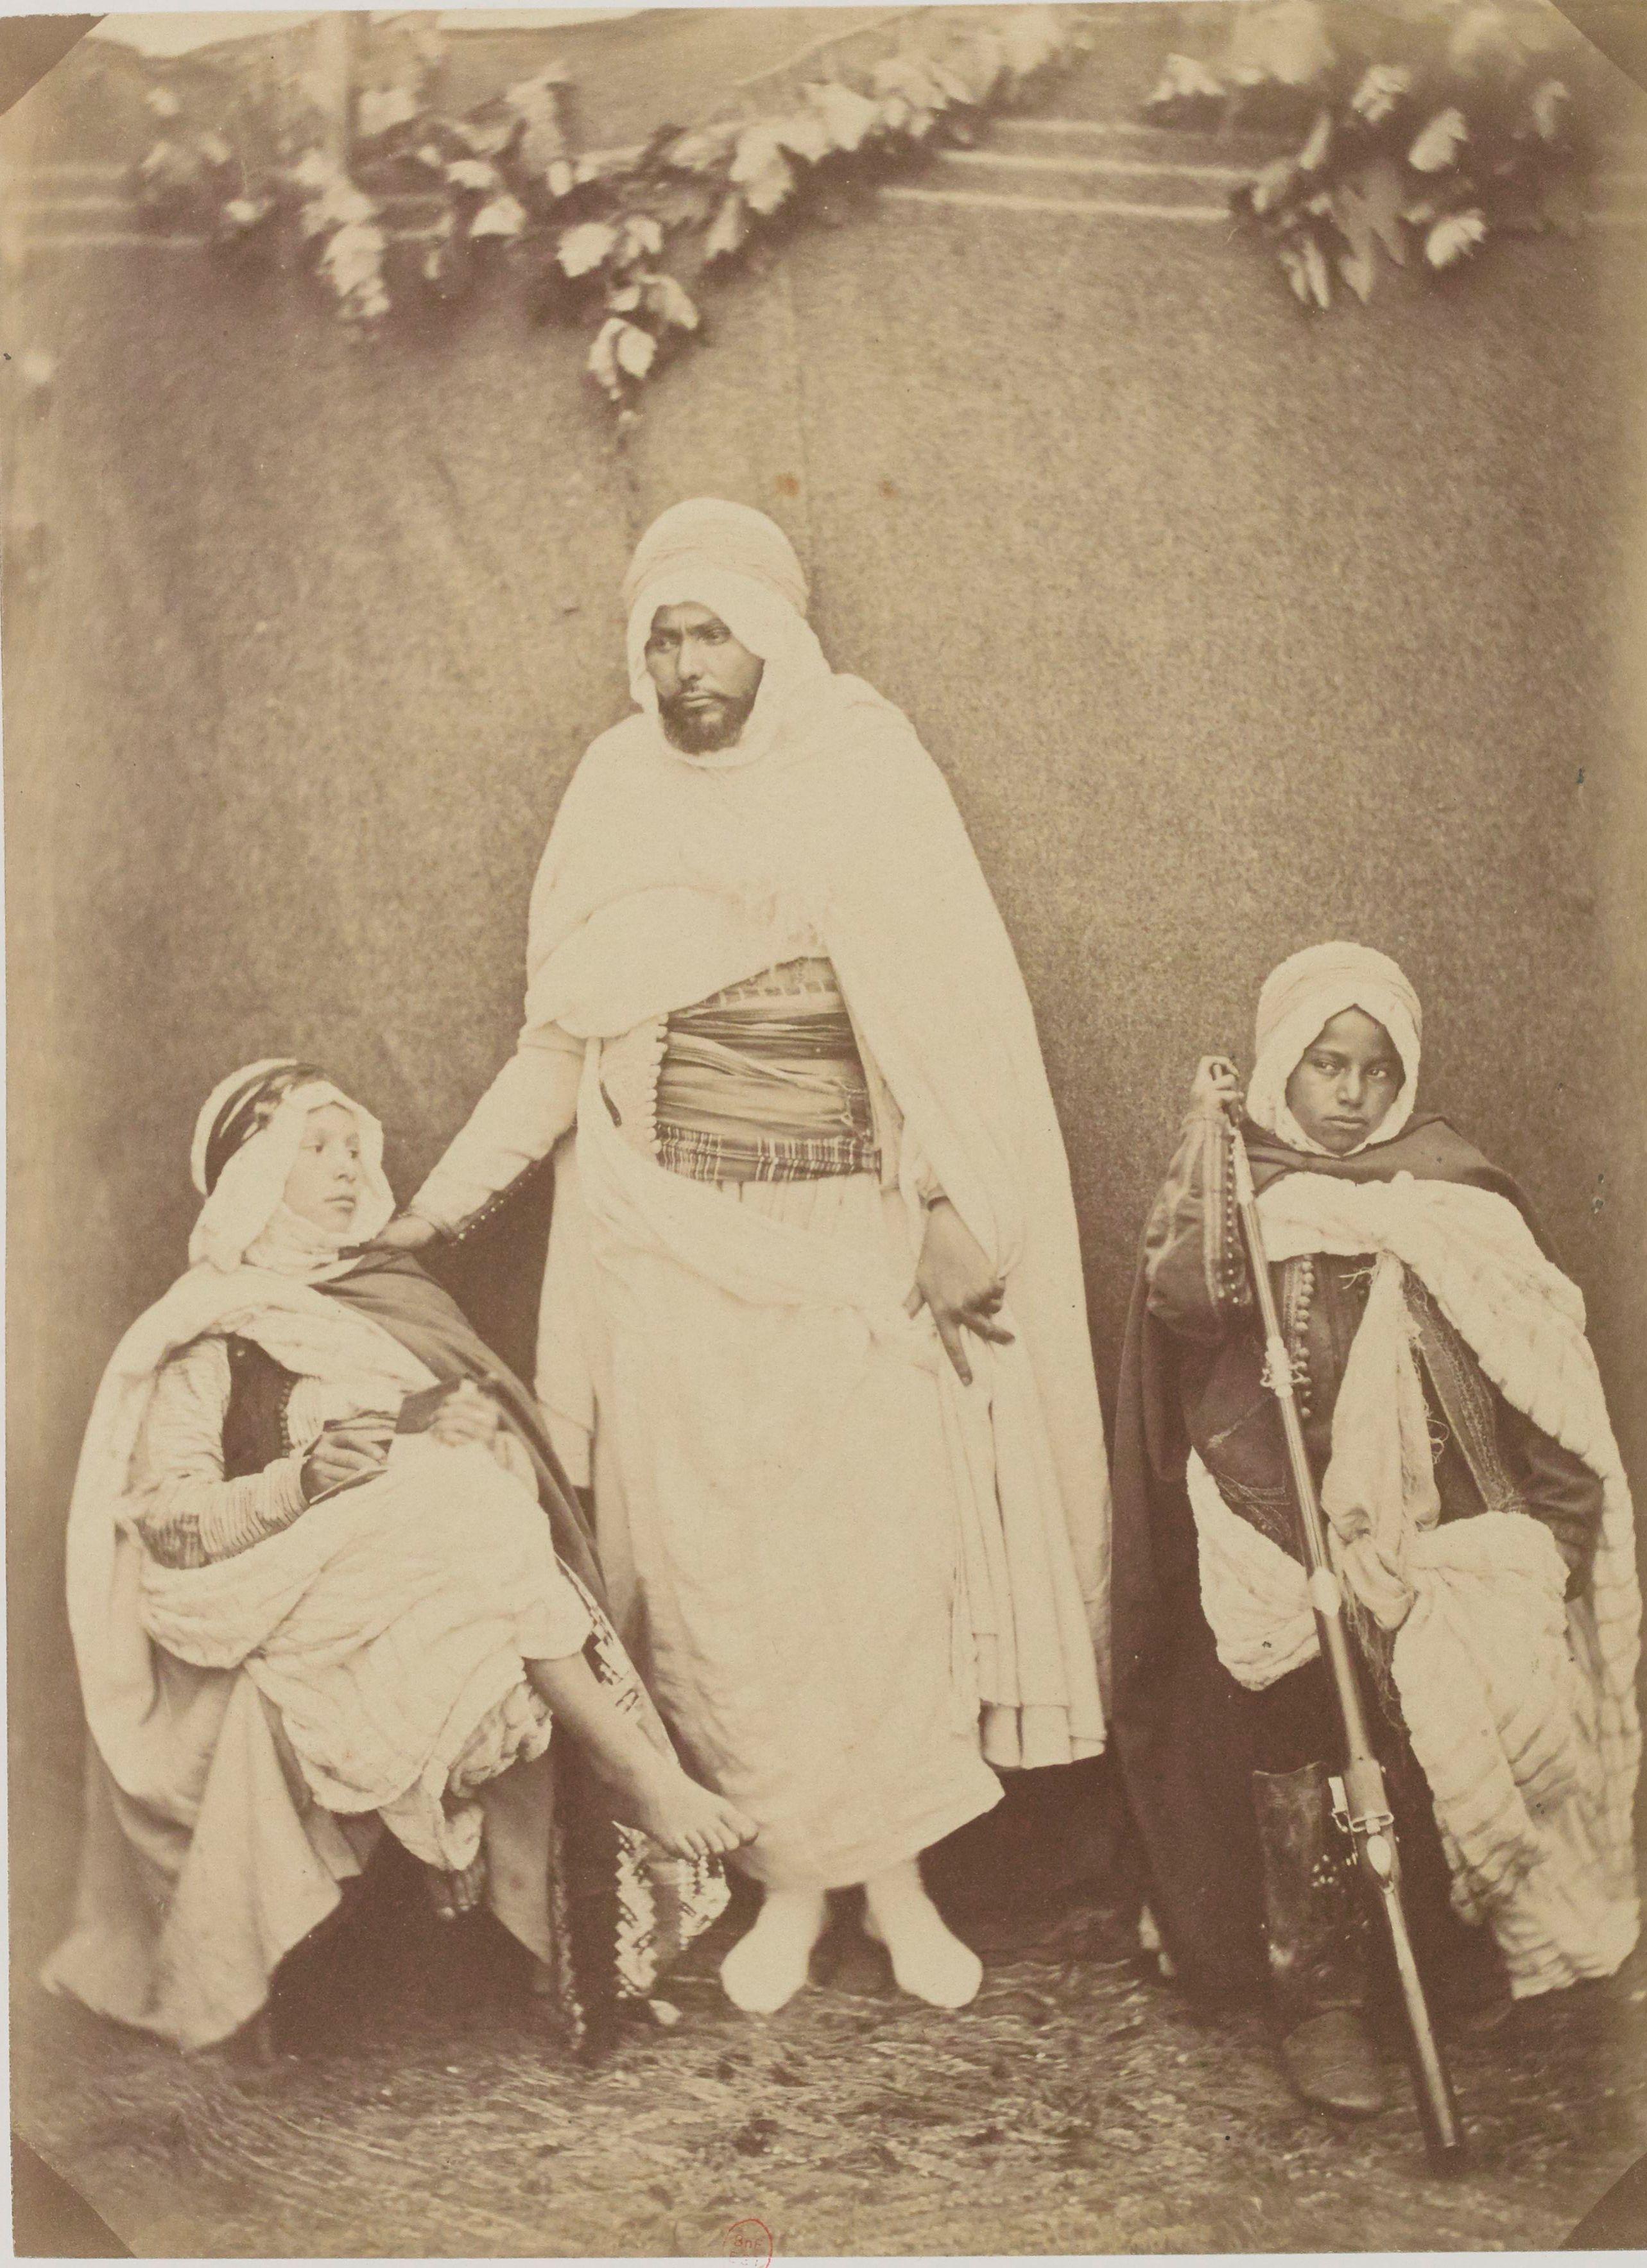 Али бен-Риа. Его брат Бел-Хадж и его два племянника Мра и Ахмед